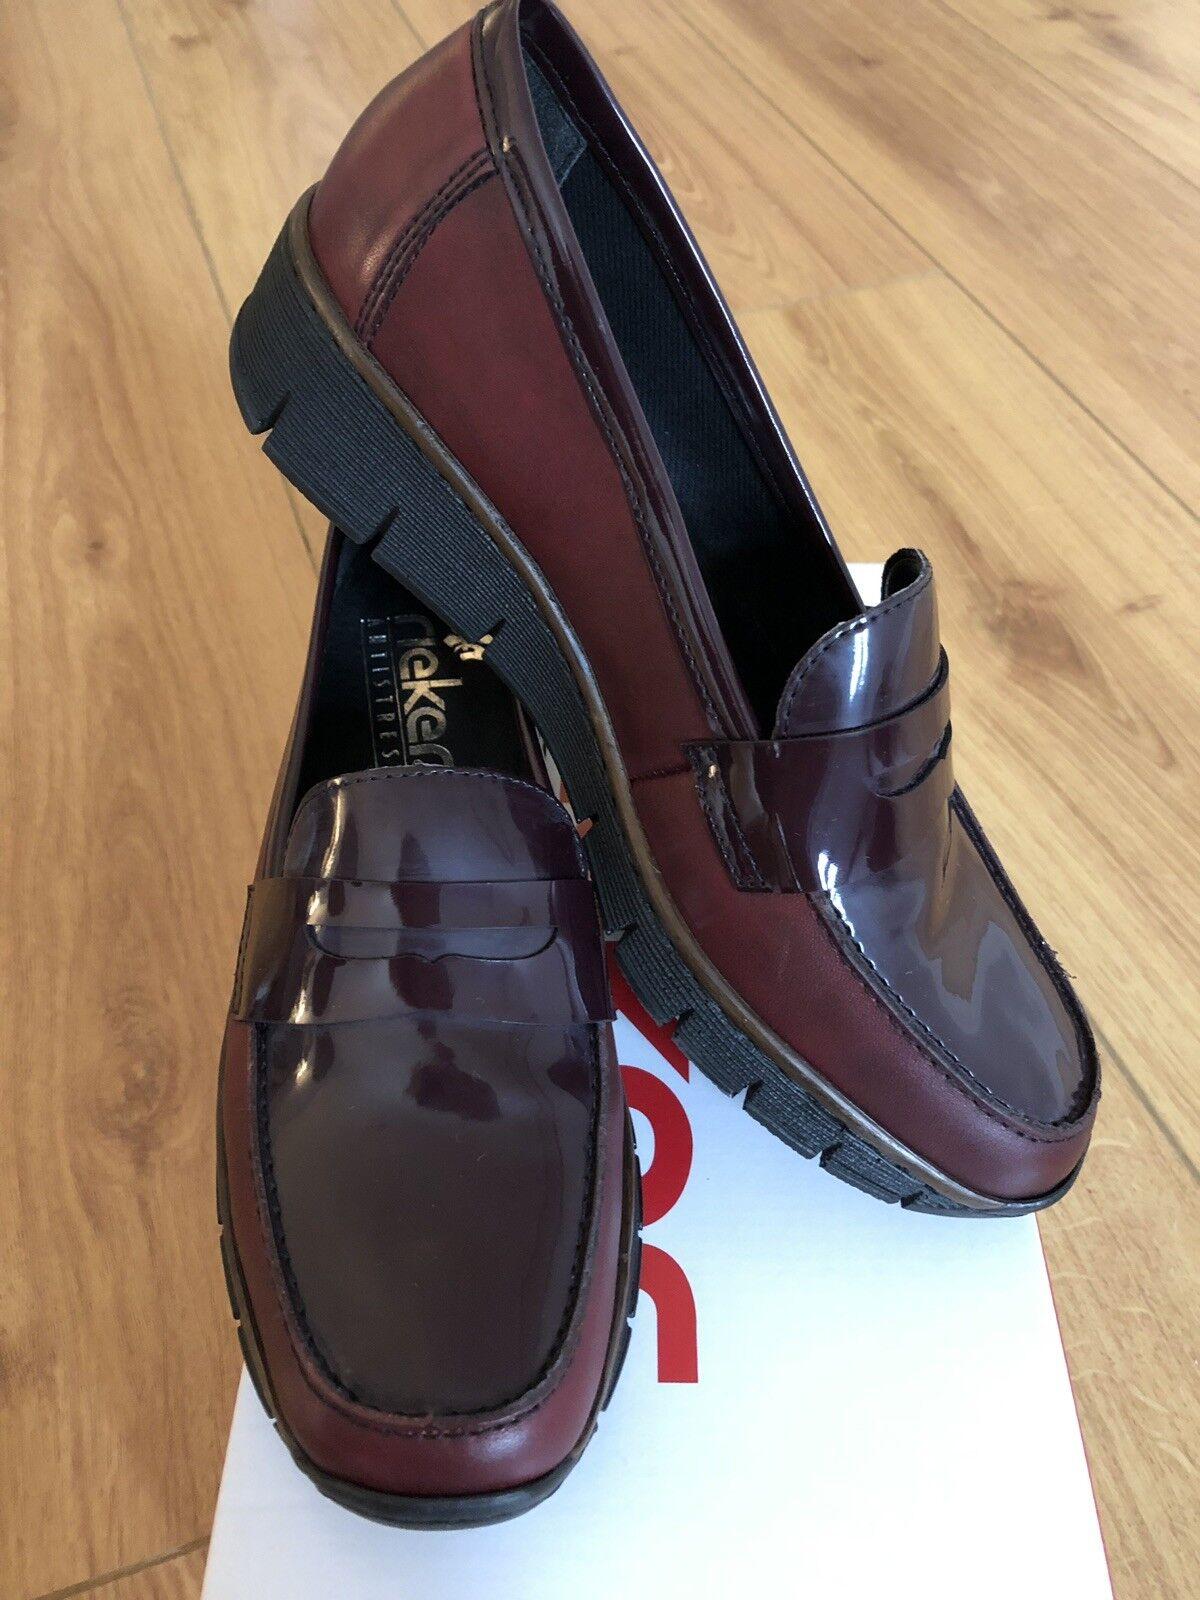 Brand New reiker comme Femmes Mocassin chaussure en Bourgogne en cuir rouge taille UK 4 37